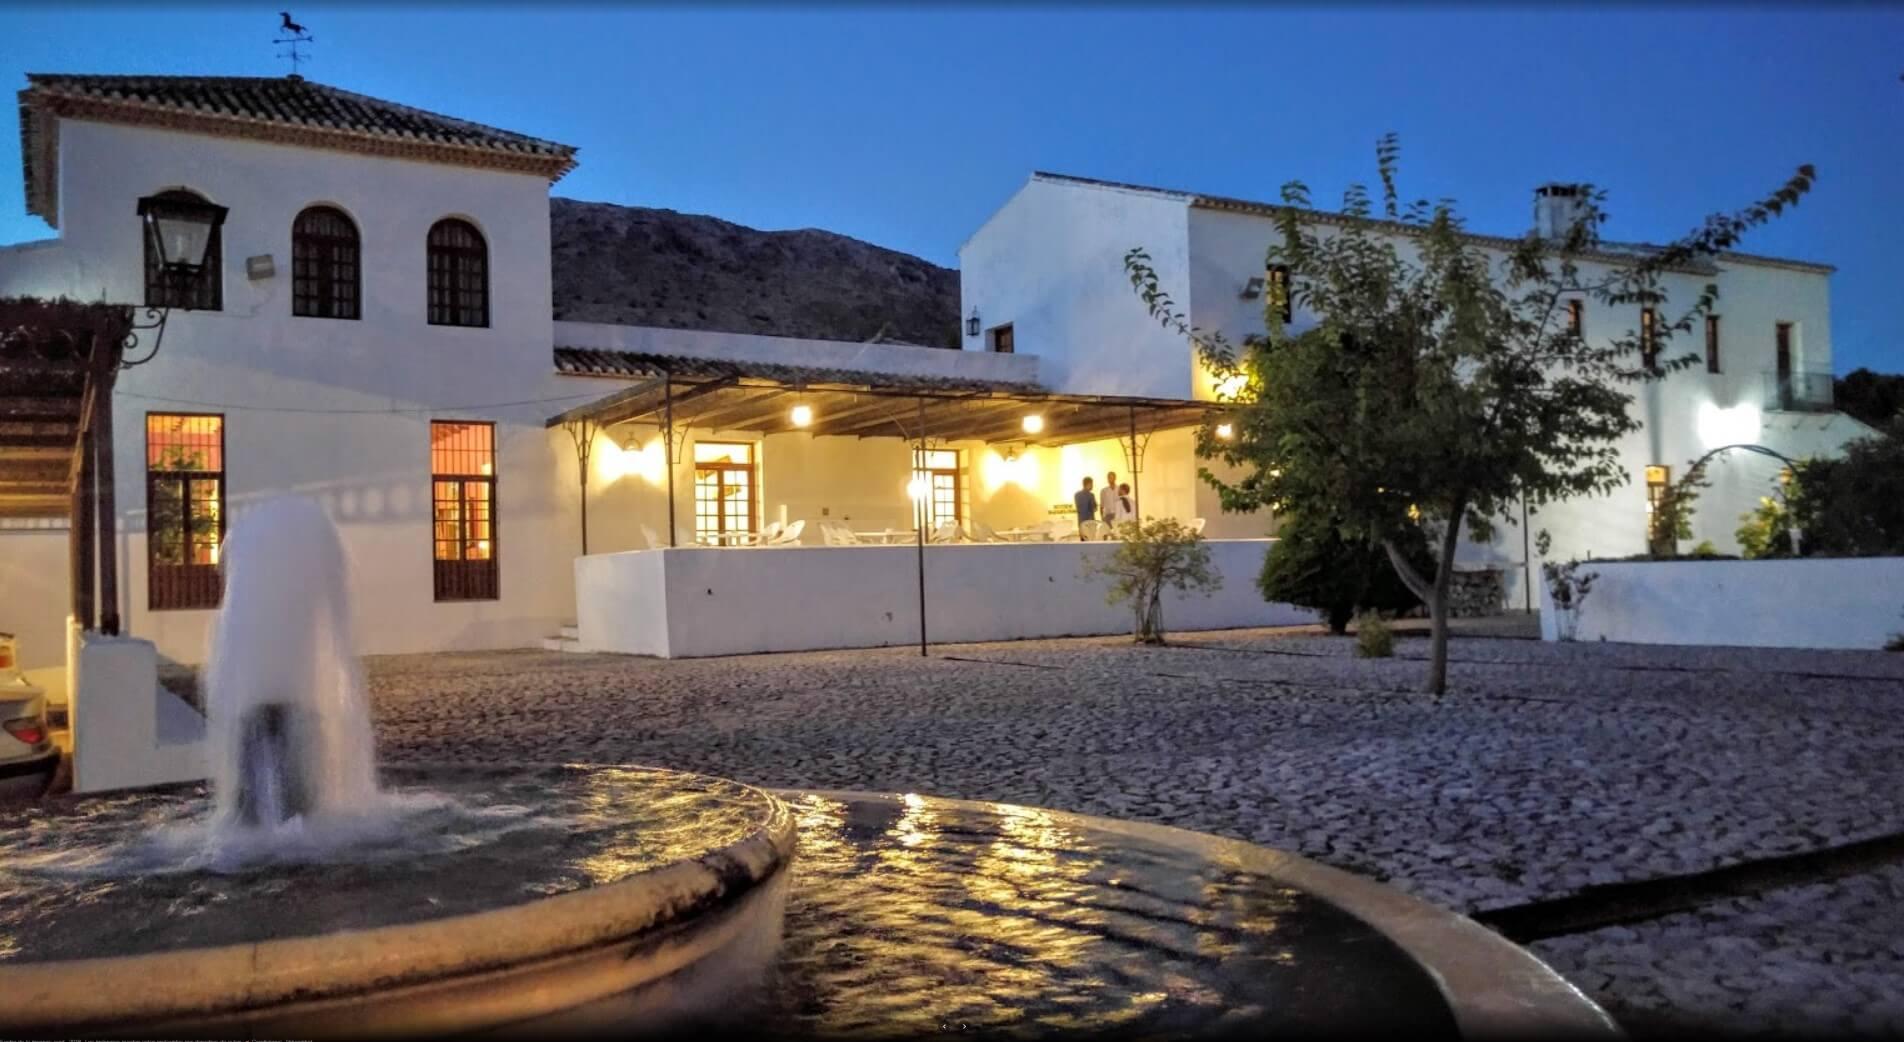 Hotel villa turistica de priego de cordoba central de for Hotel rio piscina priego de cordoba